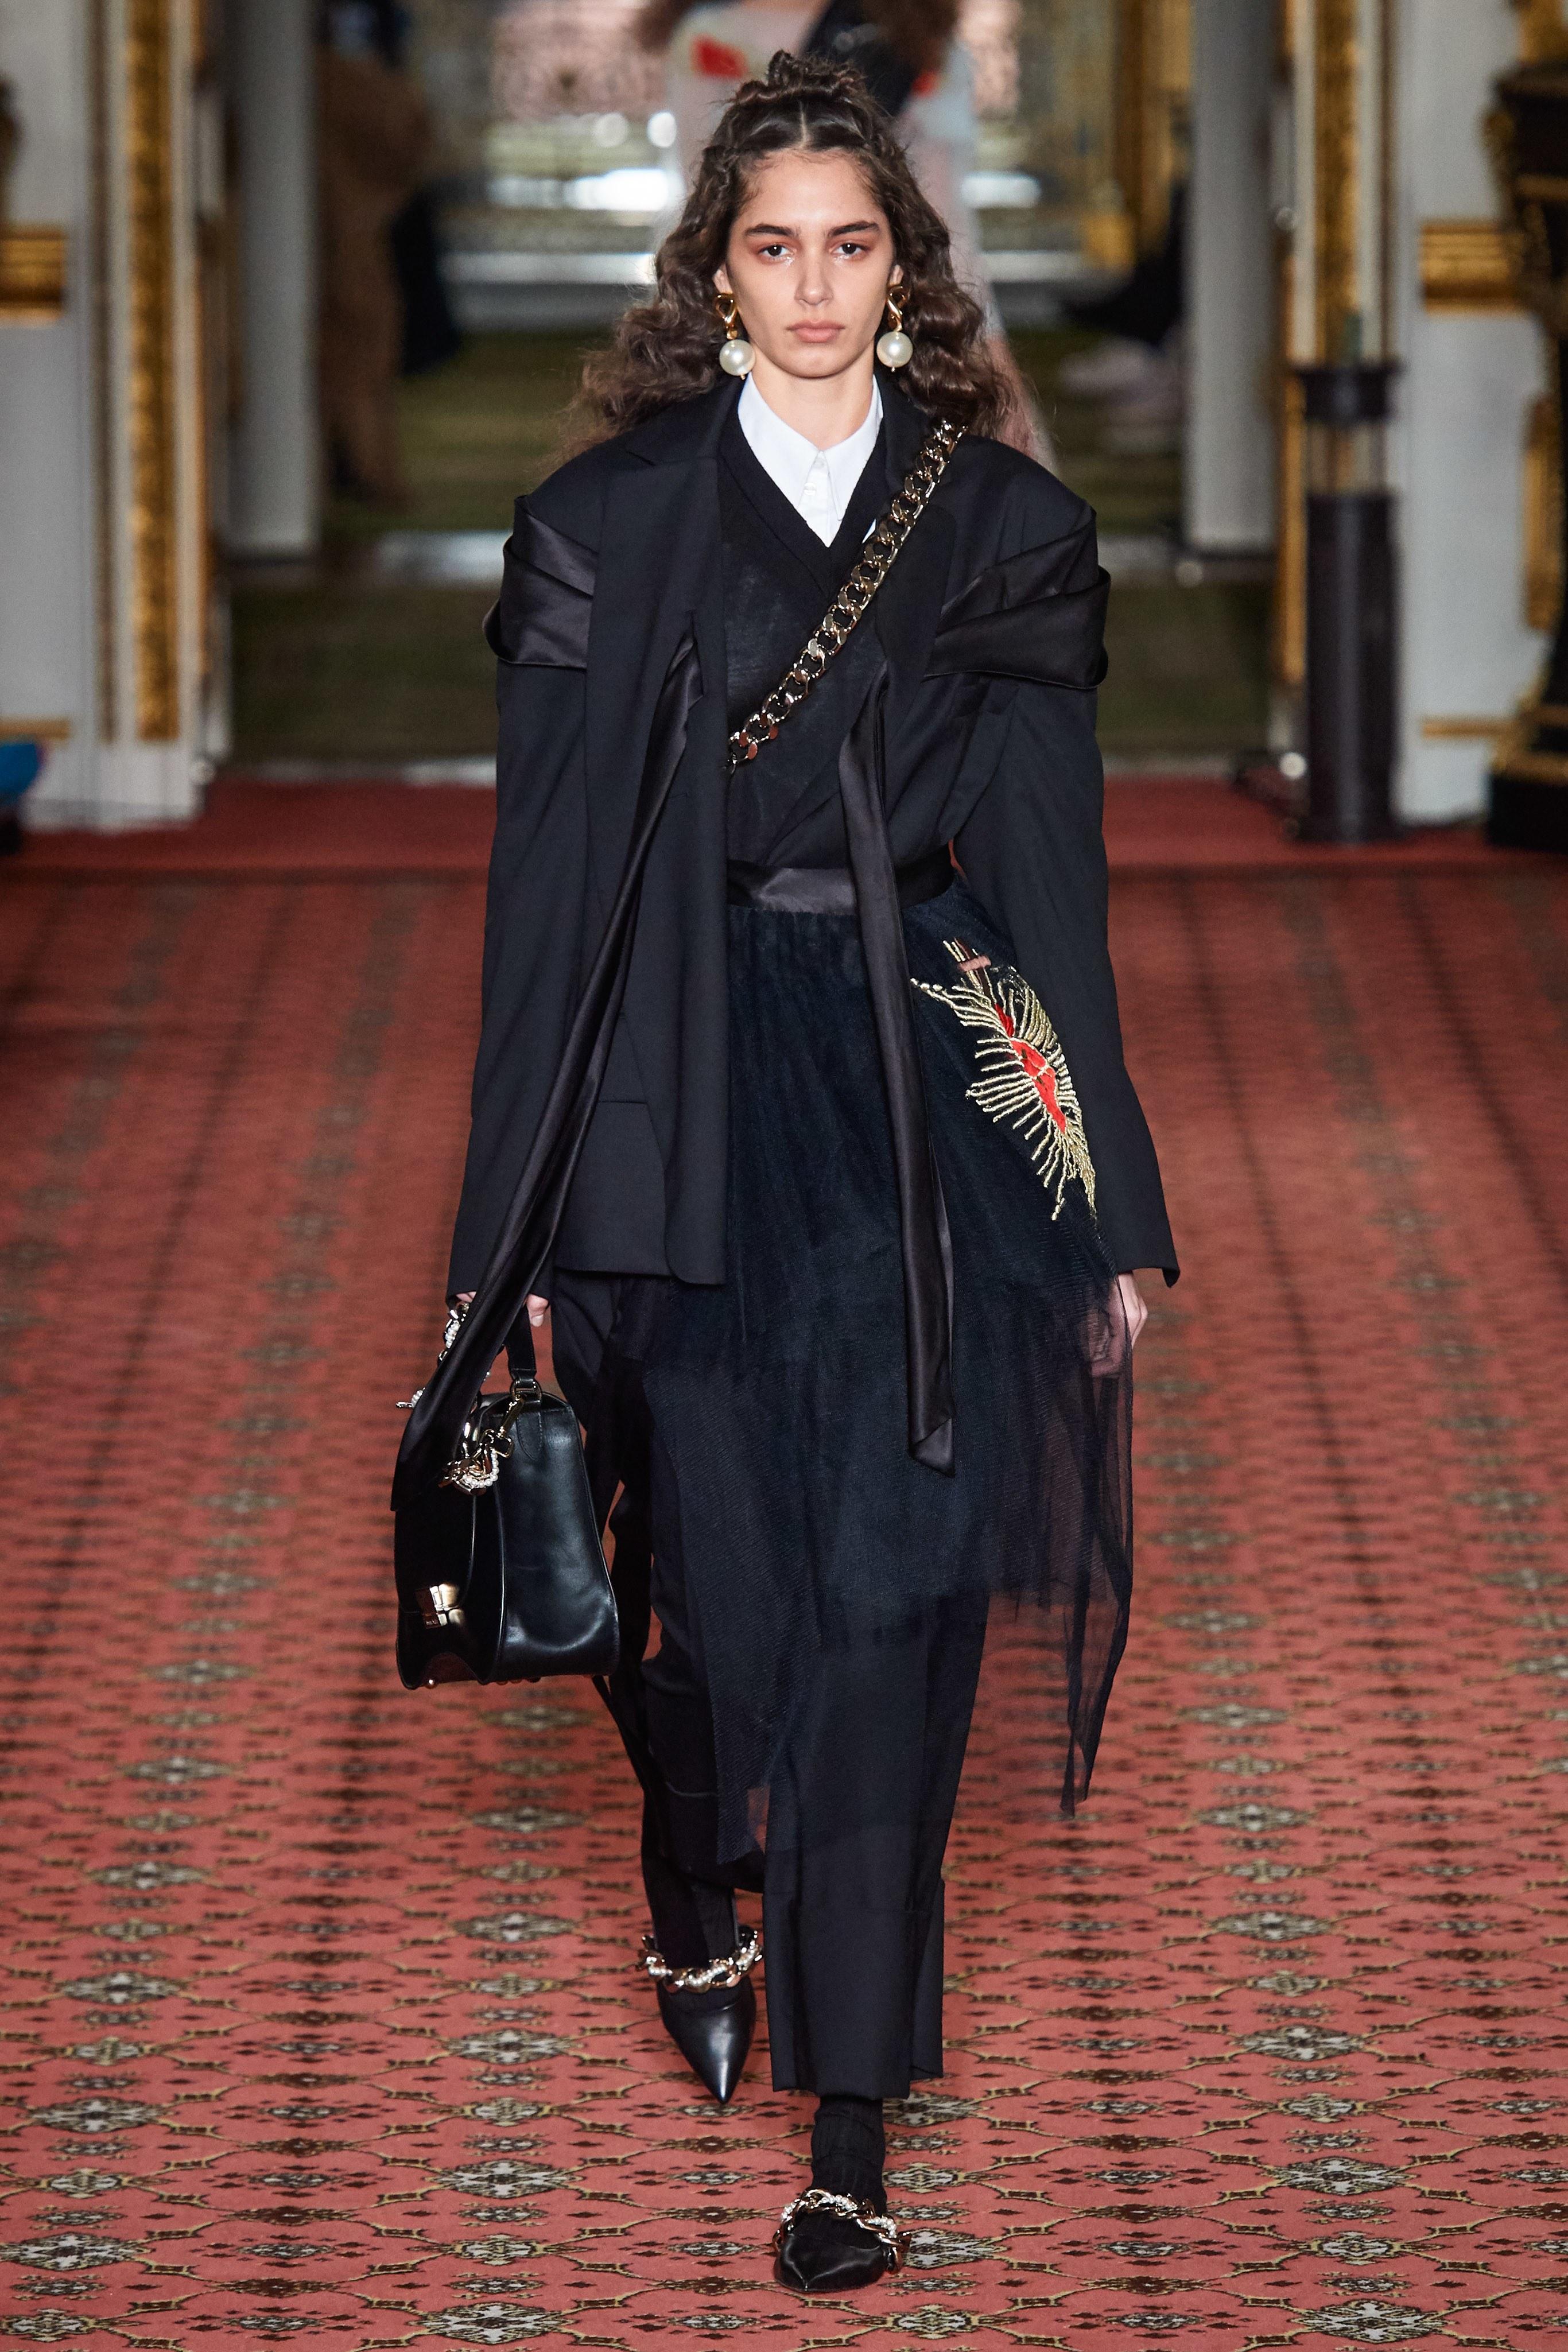 fall 2020 ready to wear simone Rocha London fashion show